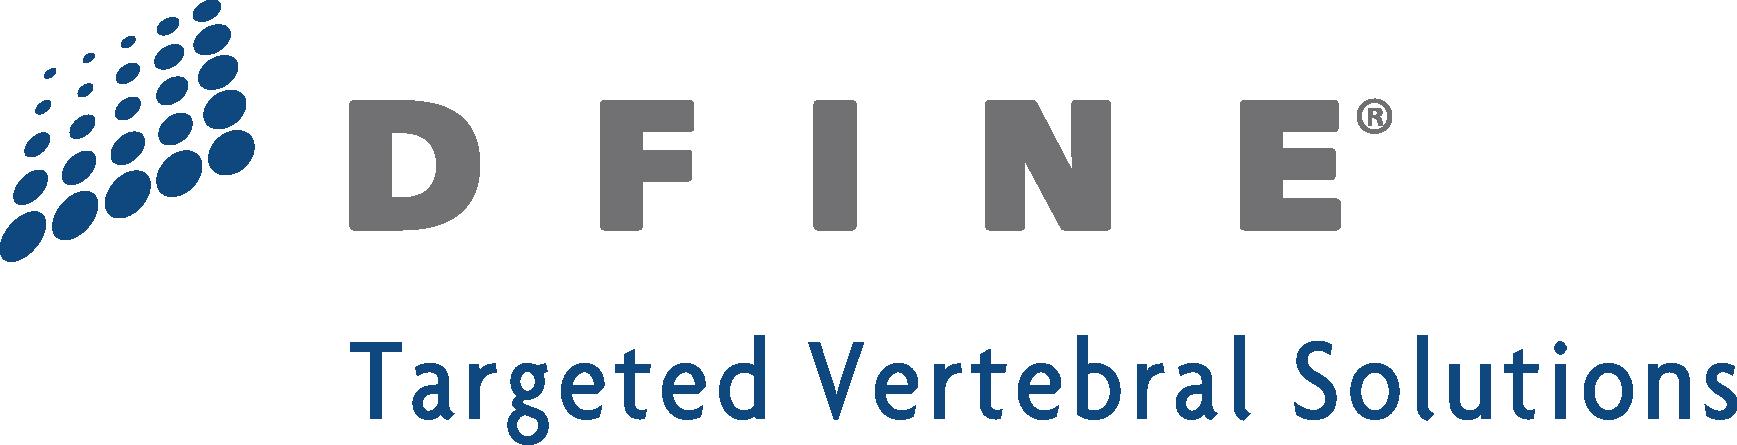 DFINE_HR_CMYK_wNEWtagline2-FNLotl-Stacked-CS6